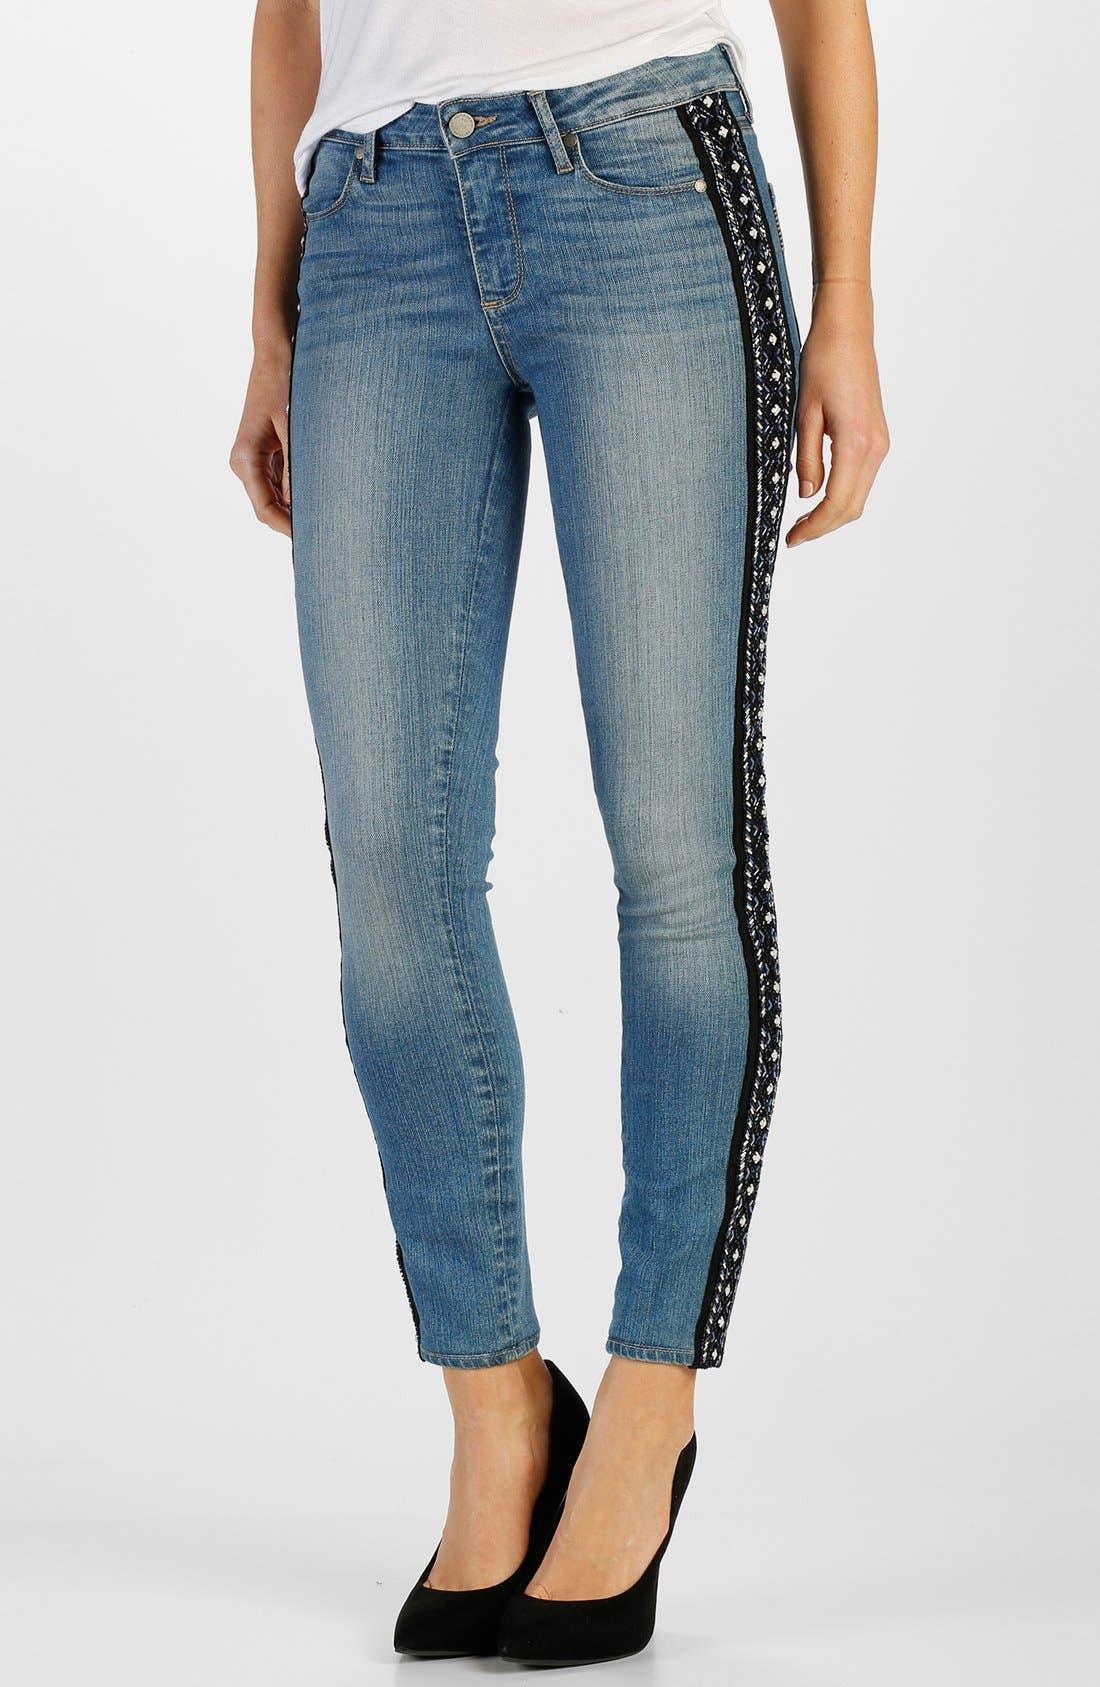 Alternate Image 1 Selected - Paige Denim 'Verdugo' Ankle Ultra Skinny Jeans (Paulina Tux Embellished)